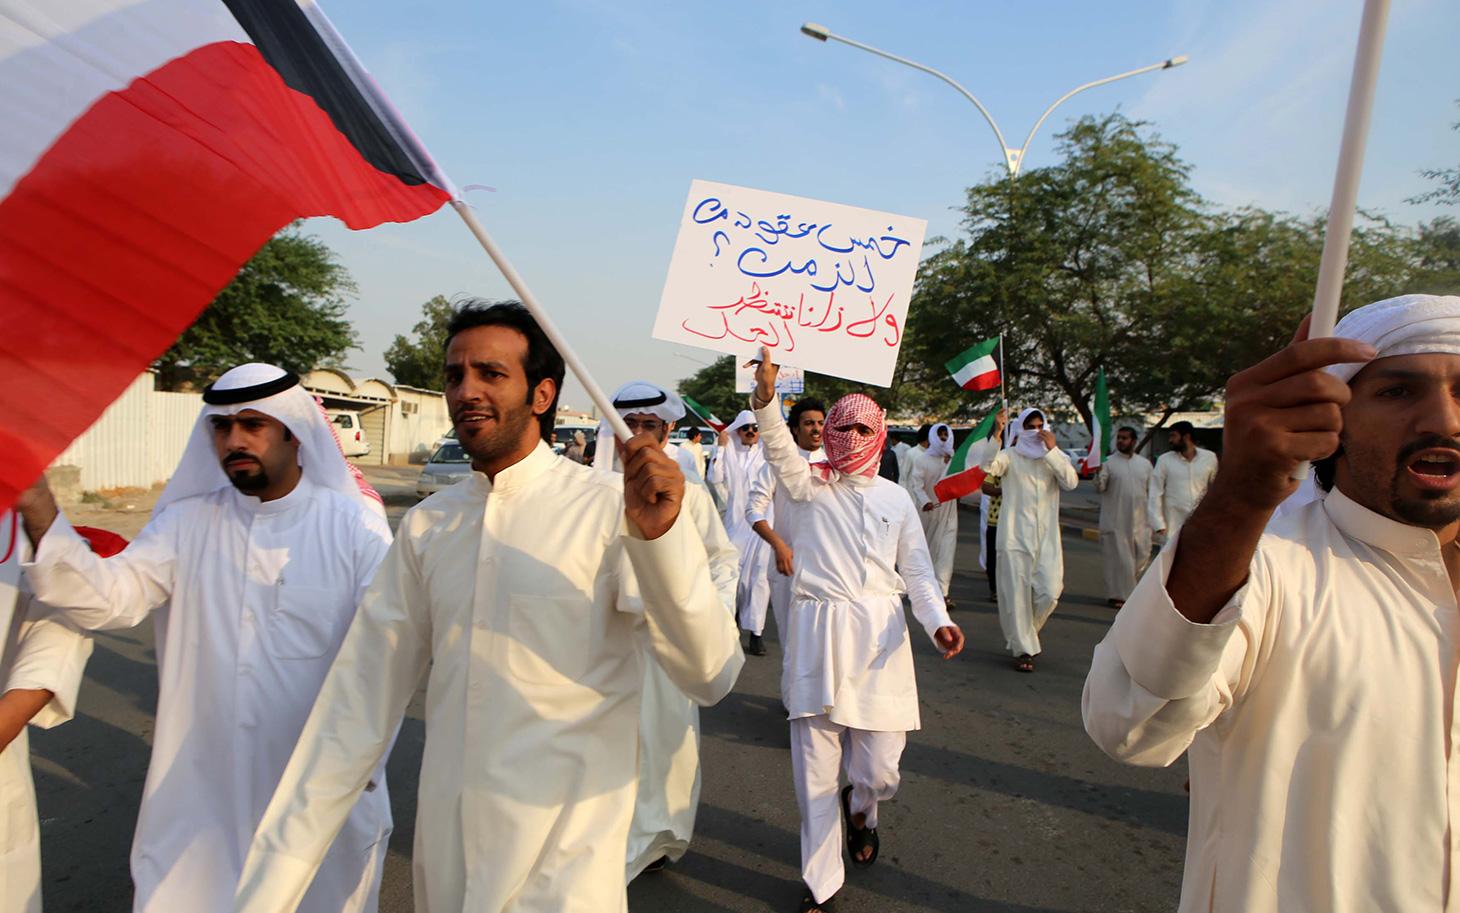 Manifestazione per i diritti del popolo Bidoon. Foto YASSER AL-ZAYYAT/AFP/Getty Images